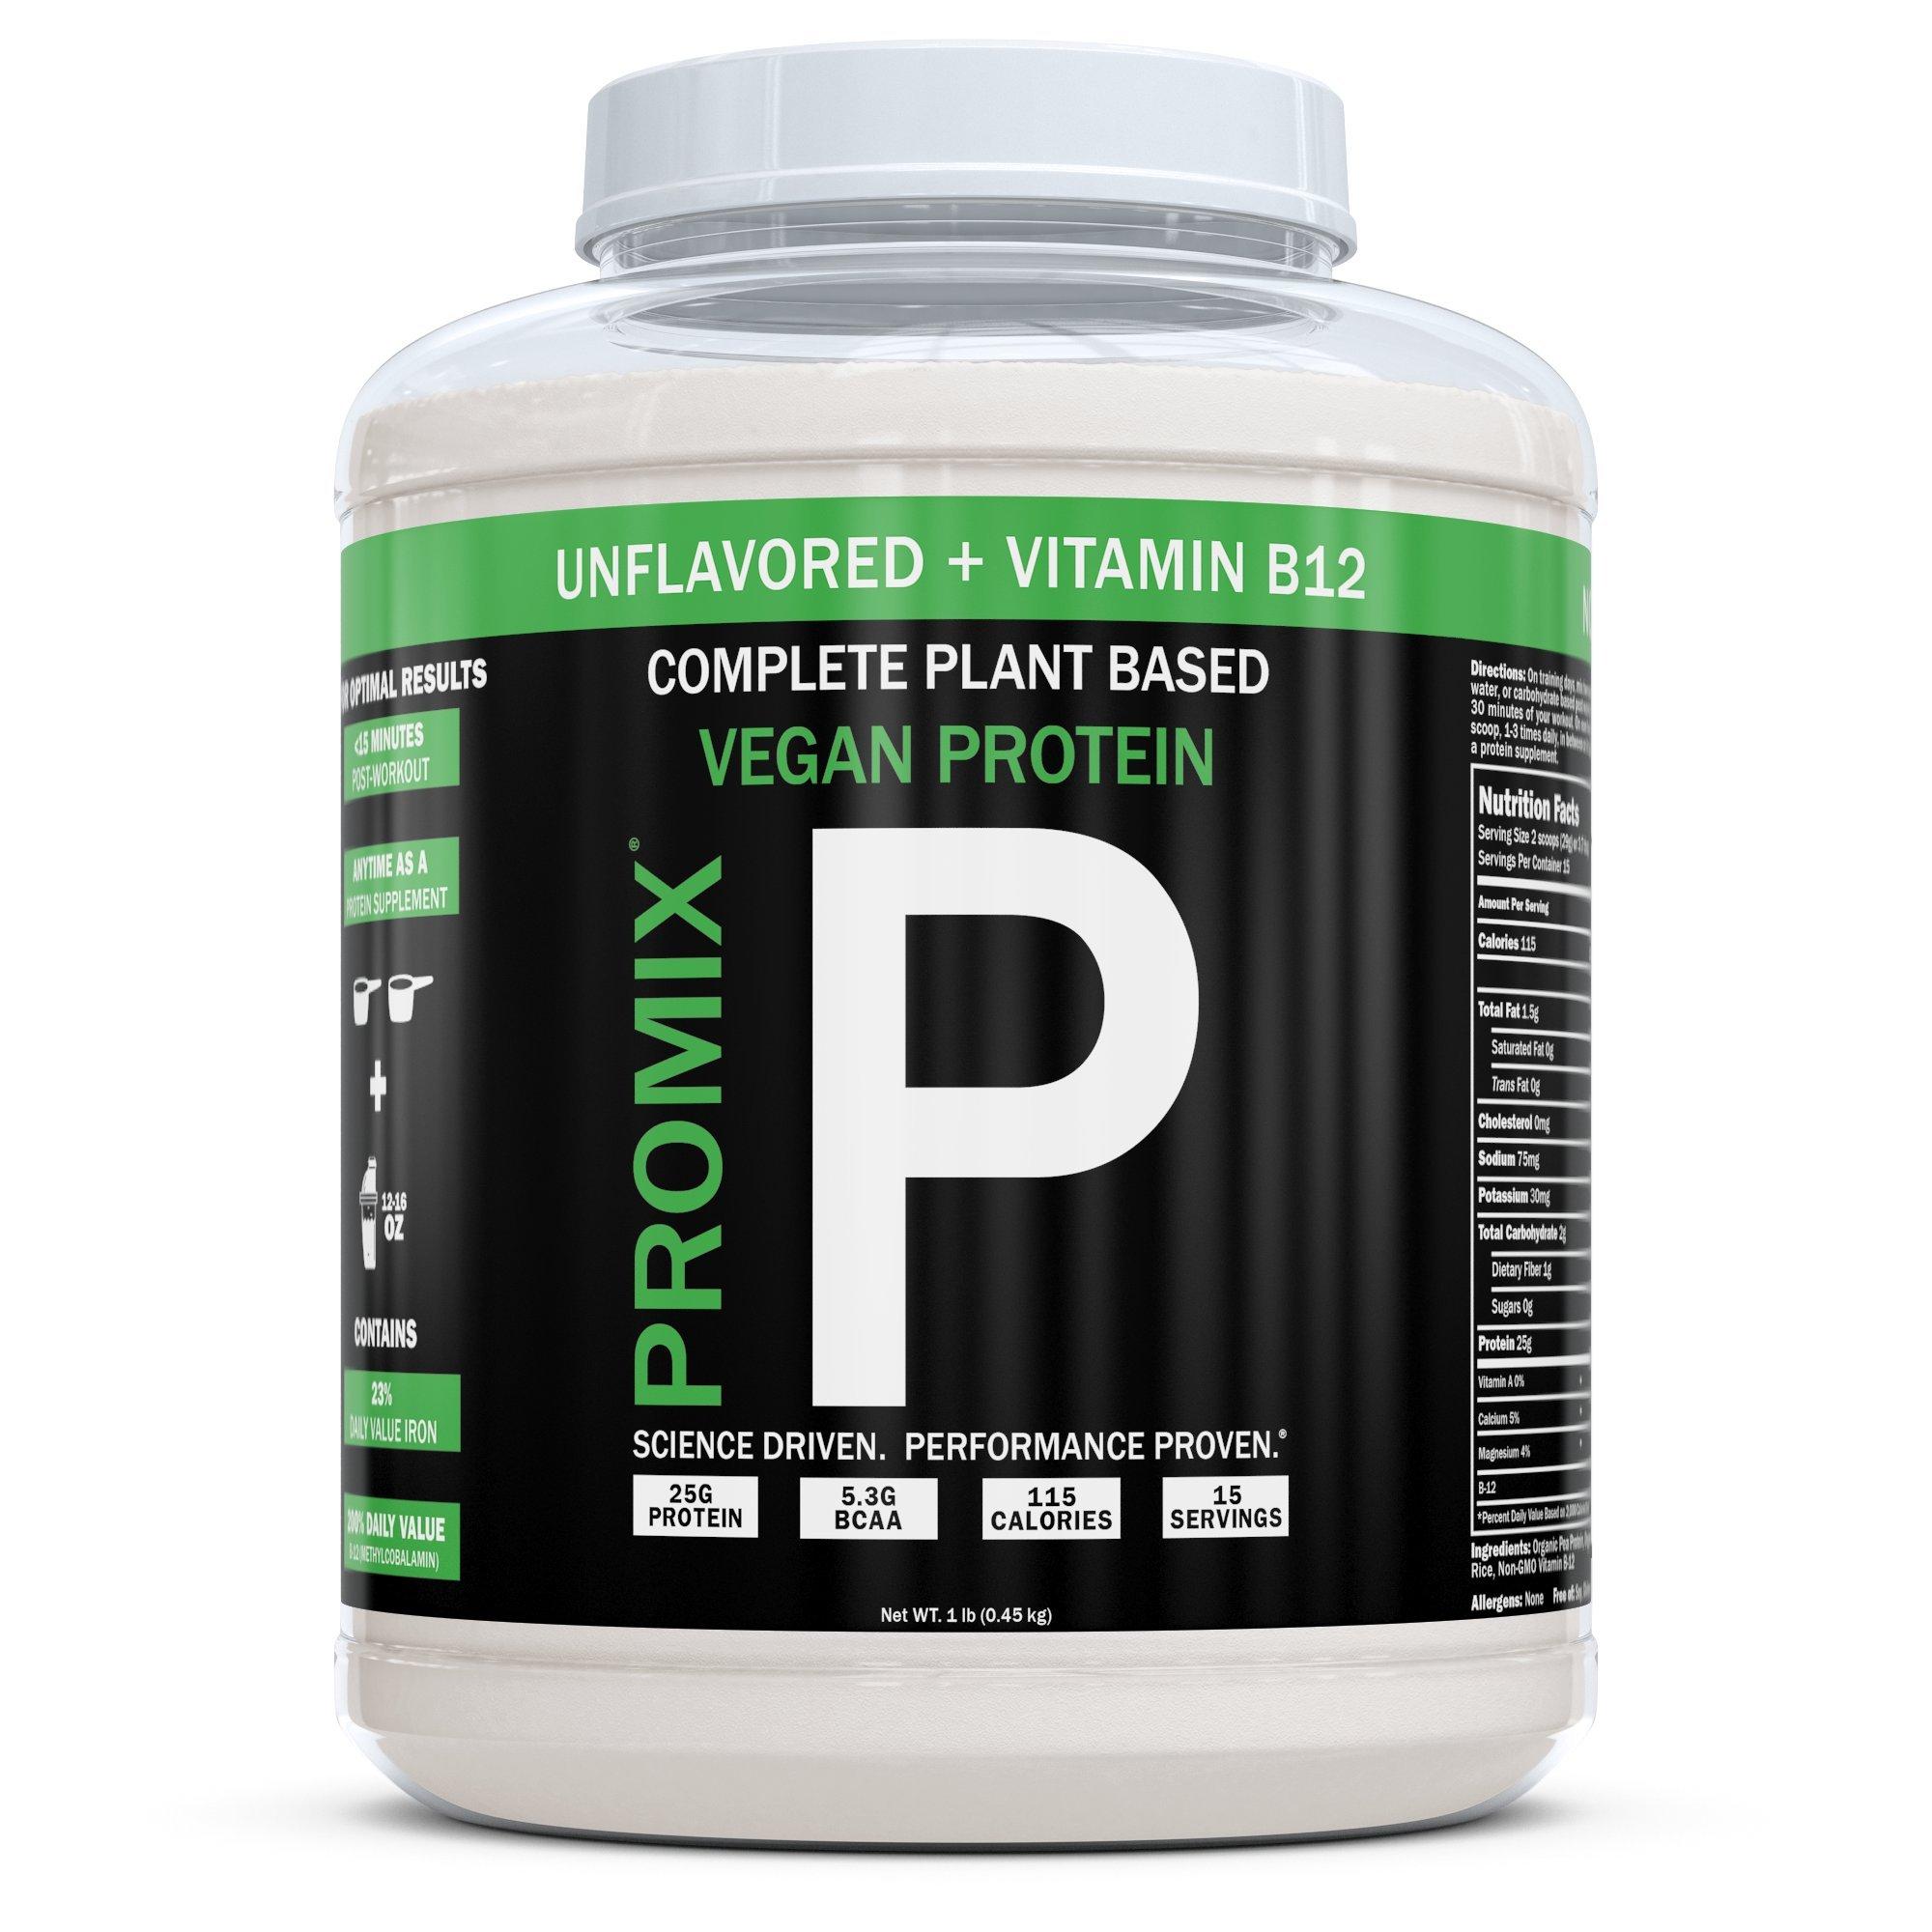 PROMIX Vegan Protein Powder | Dairy Free, Non GMO, Gluten Free, Organic (1 Pound, Vegan + B12)